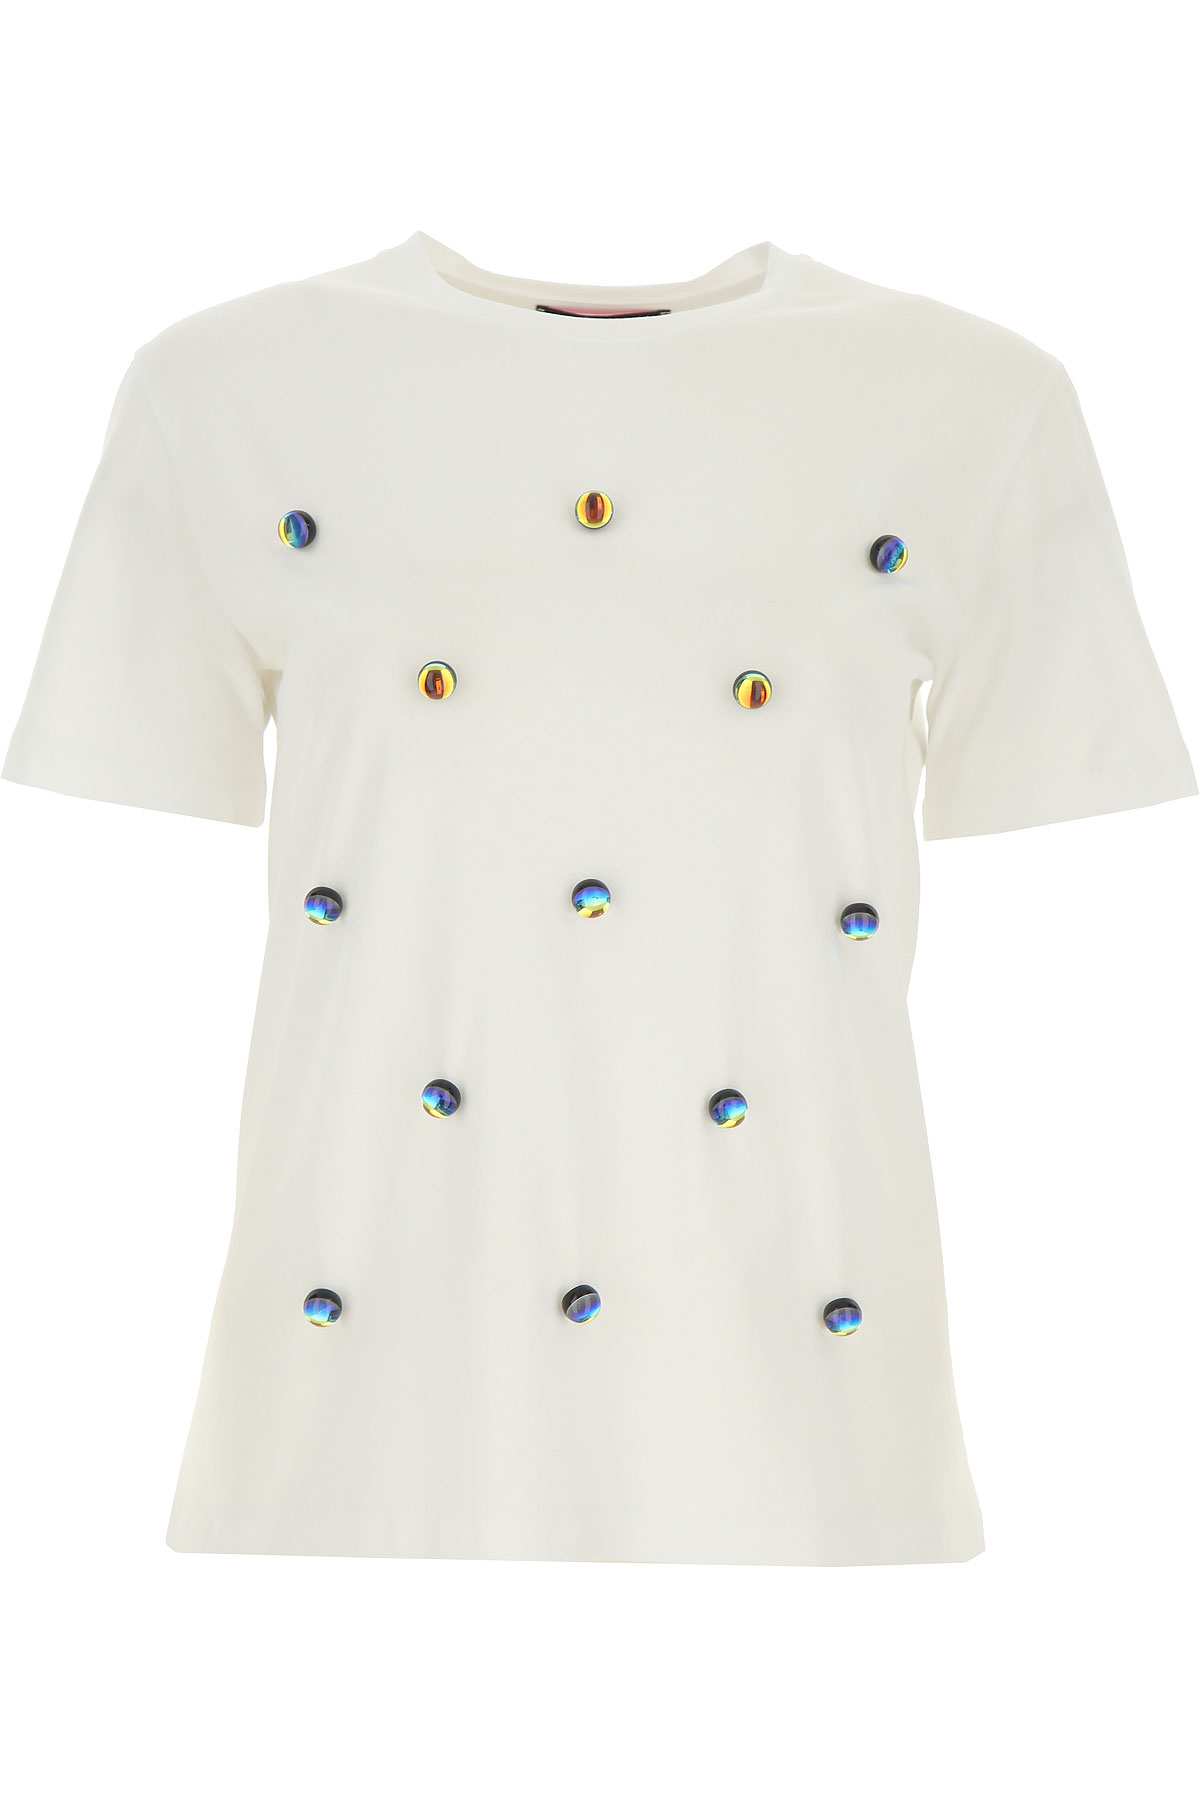 Giulia Rositani T-shirt Femme, Blanc, Coton, 2017, 40 44 46 M